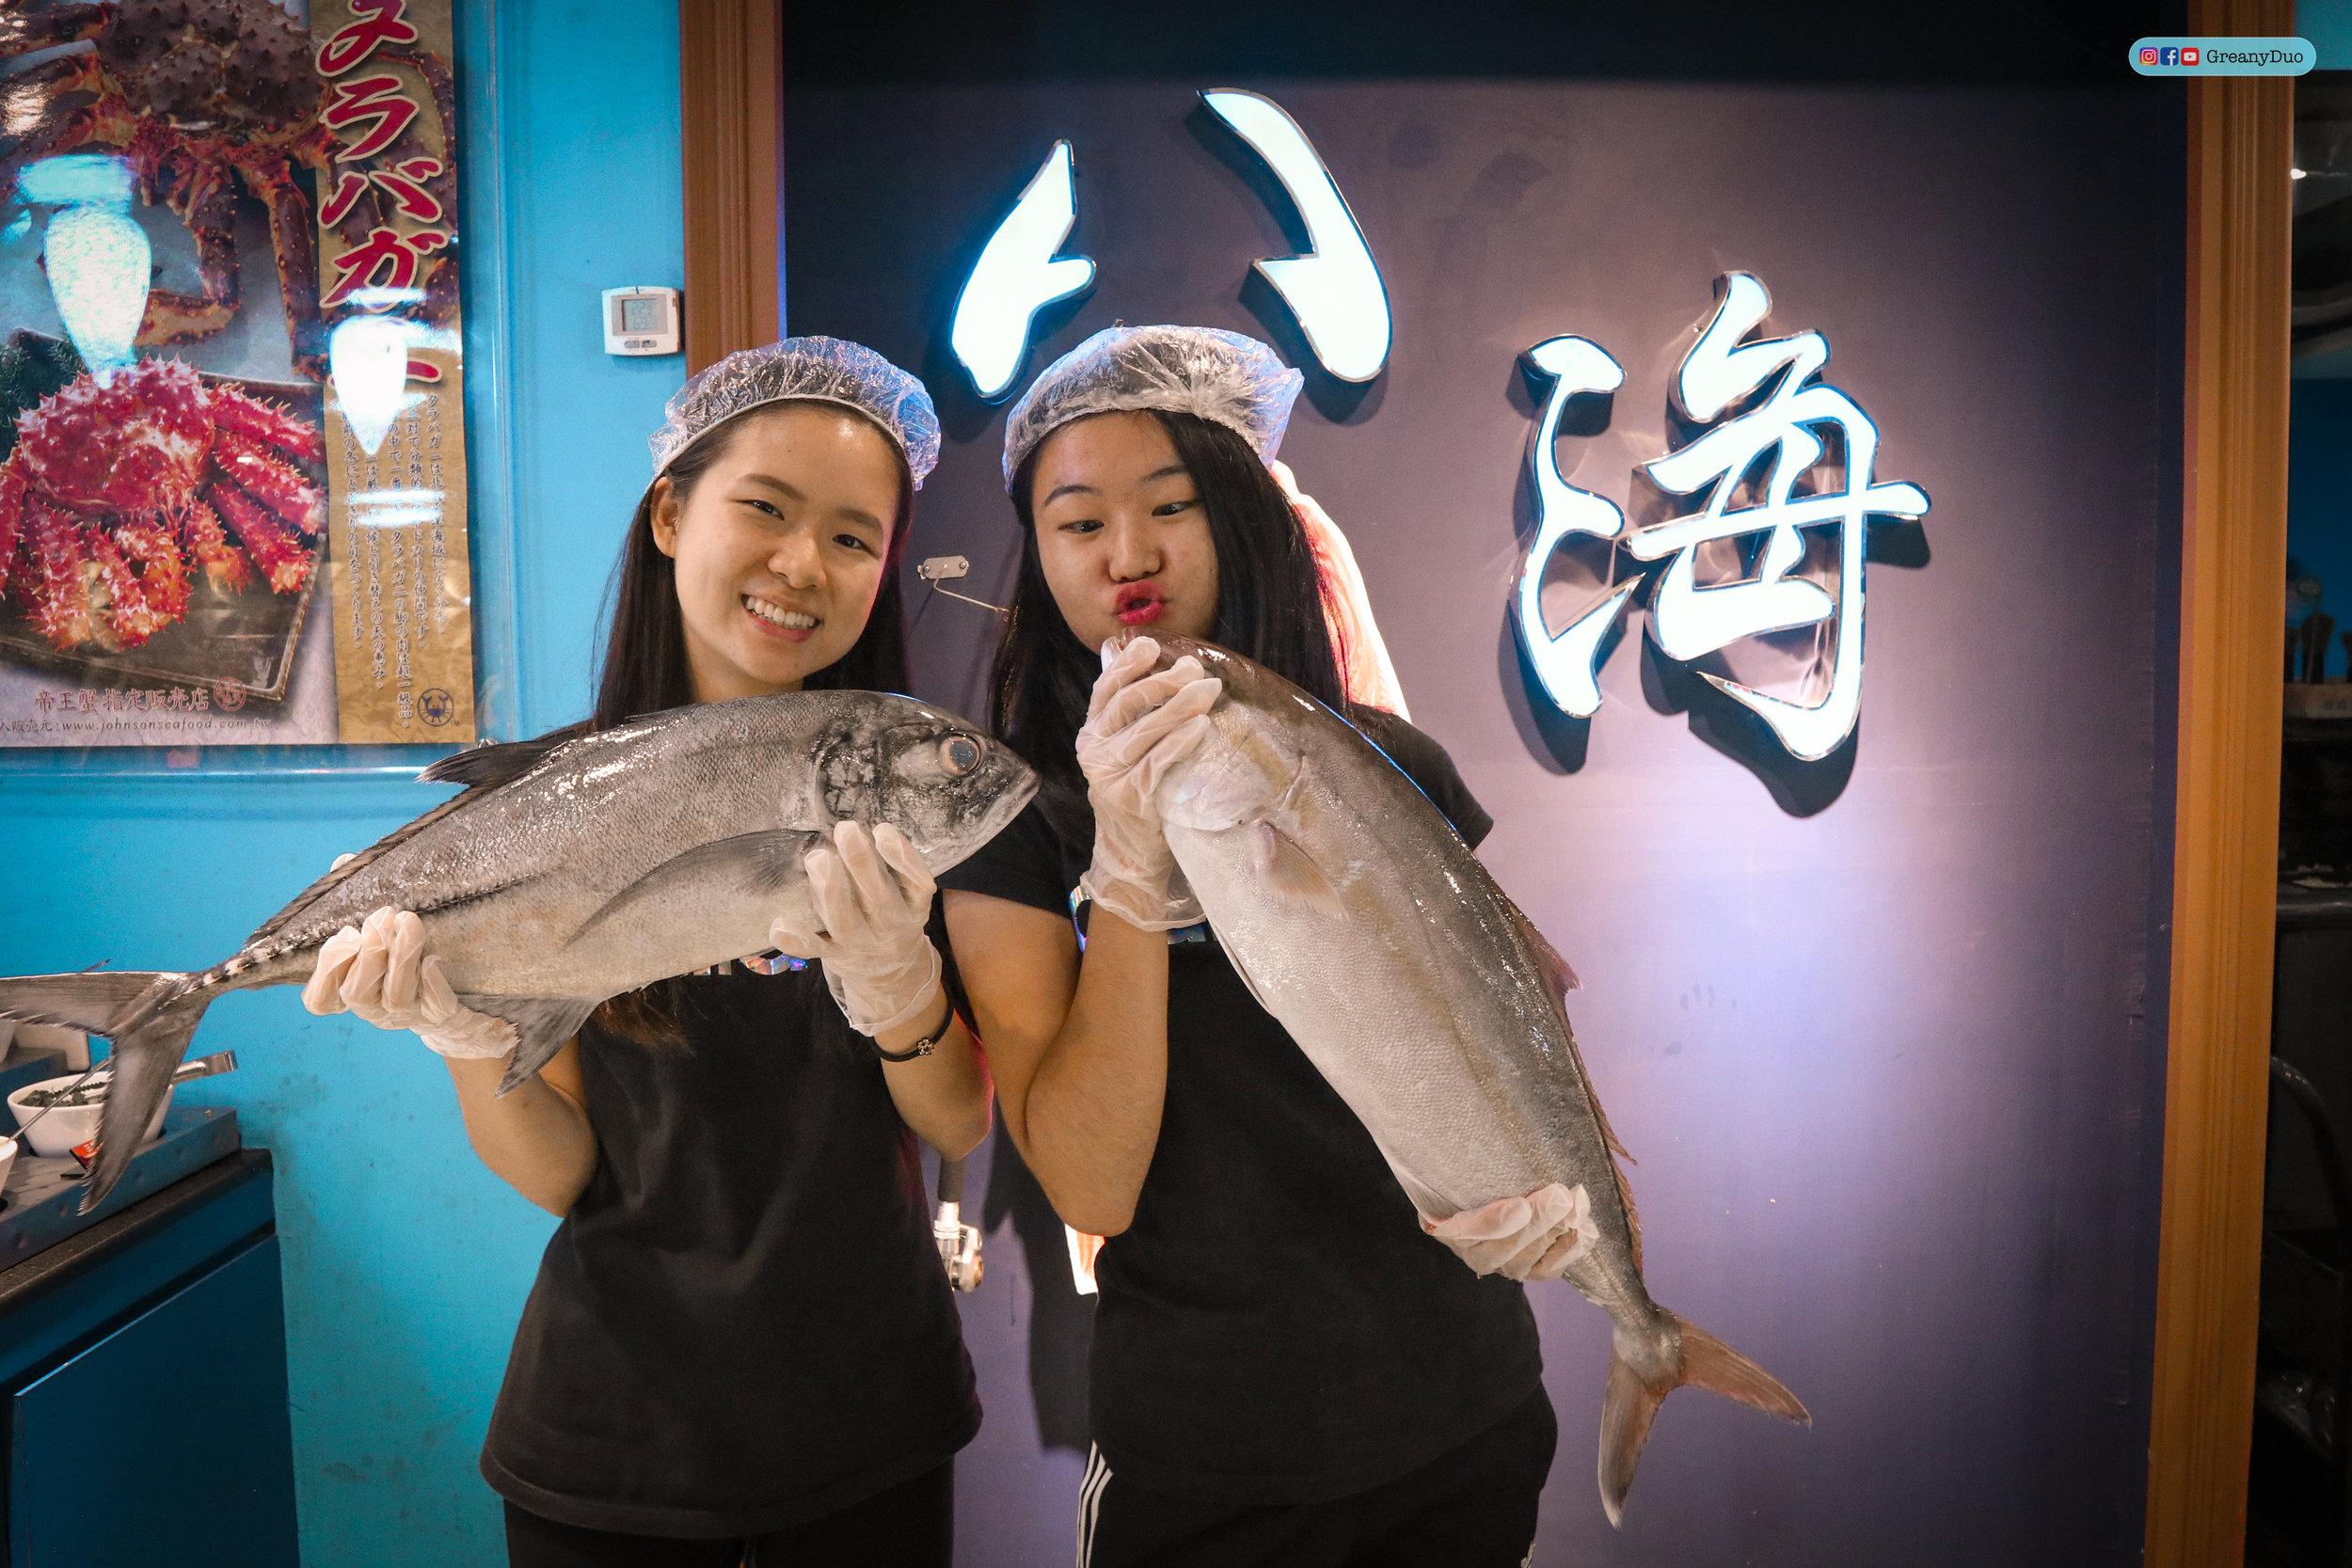 jenny and tina posing with fishes at บุฟเฟ่ต์ชาบูไต้หวันที่ Hakkai Shabu Shabu ซีเหมินติง